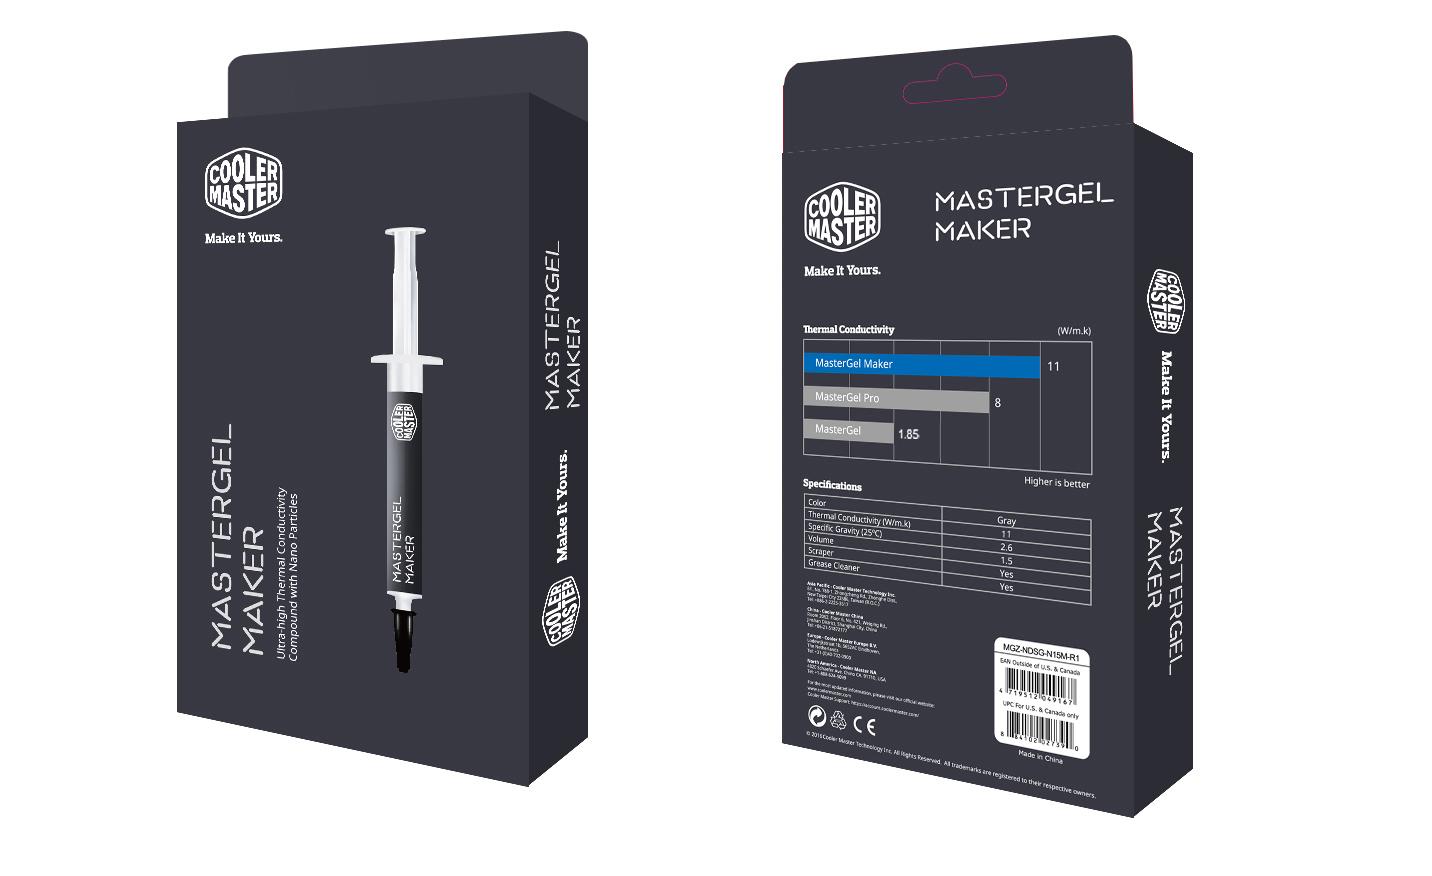 7_Product_MasterGel Maker-2.jpg